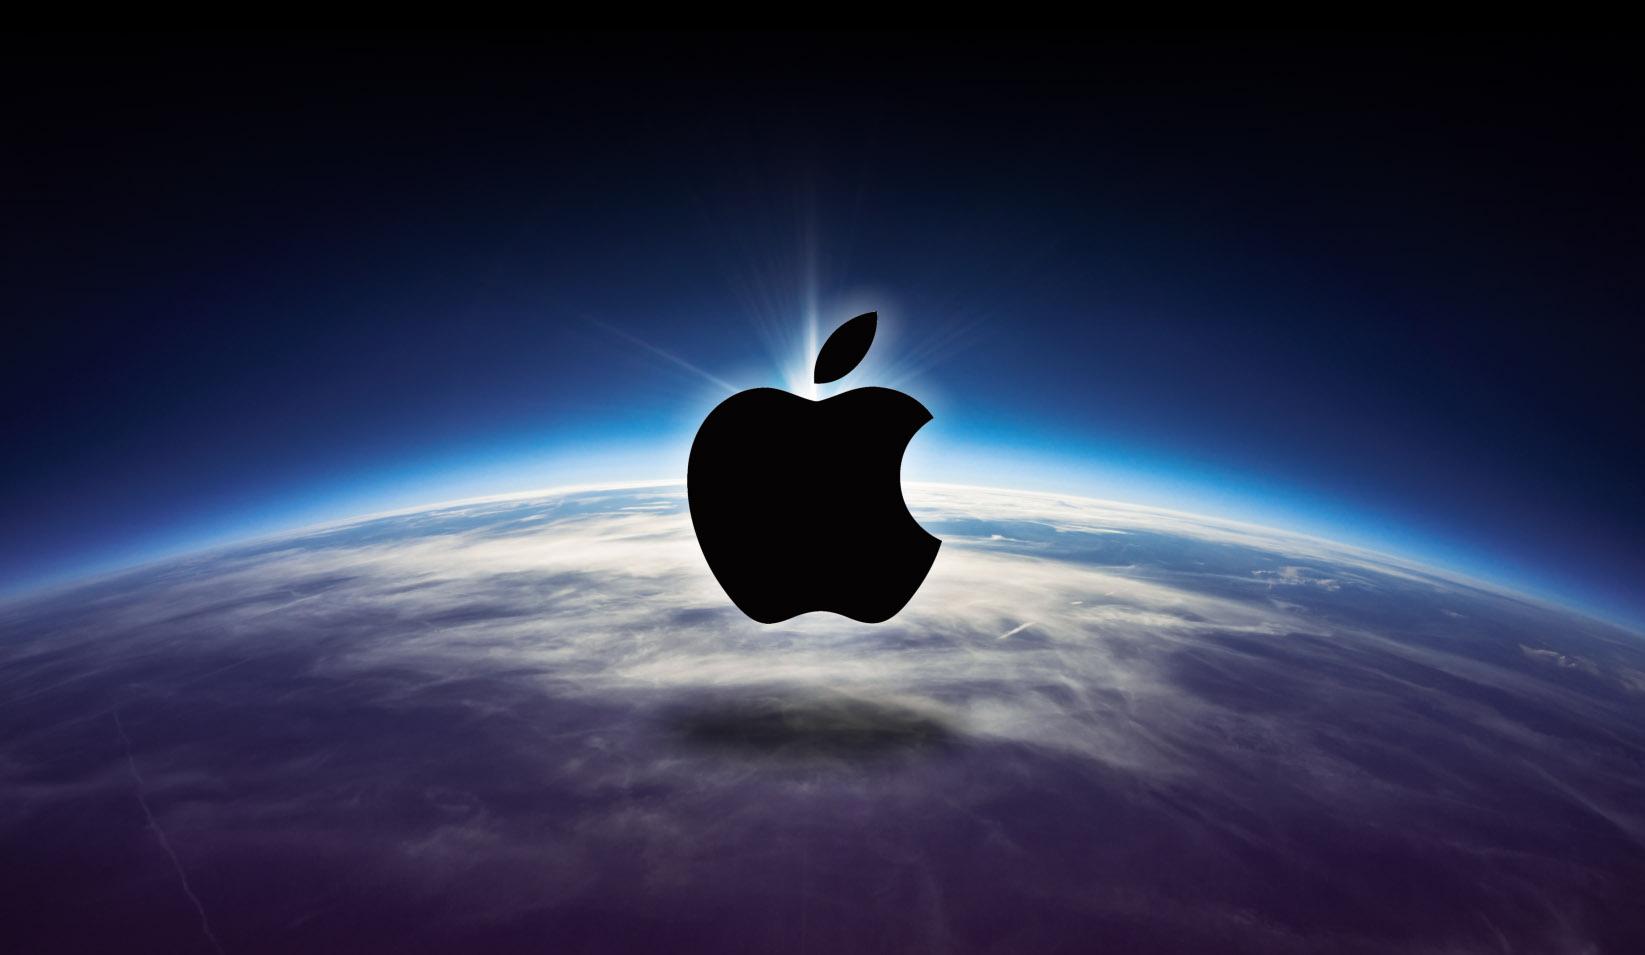 Apple Q3 2018 Earnings